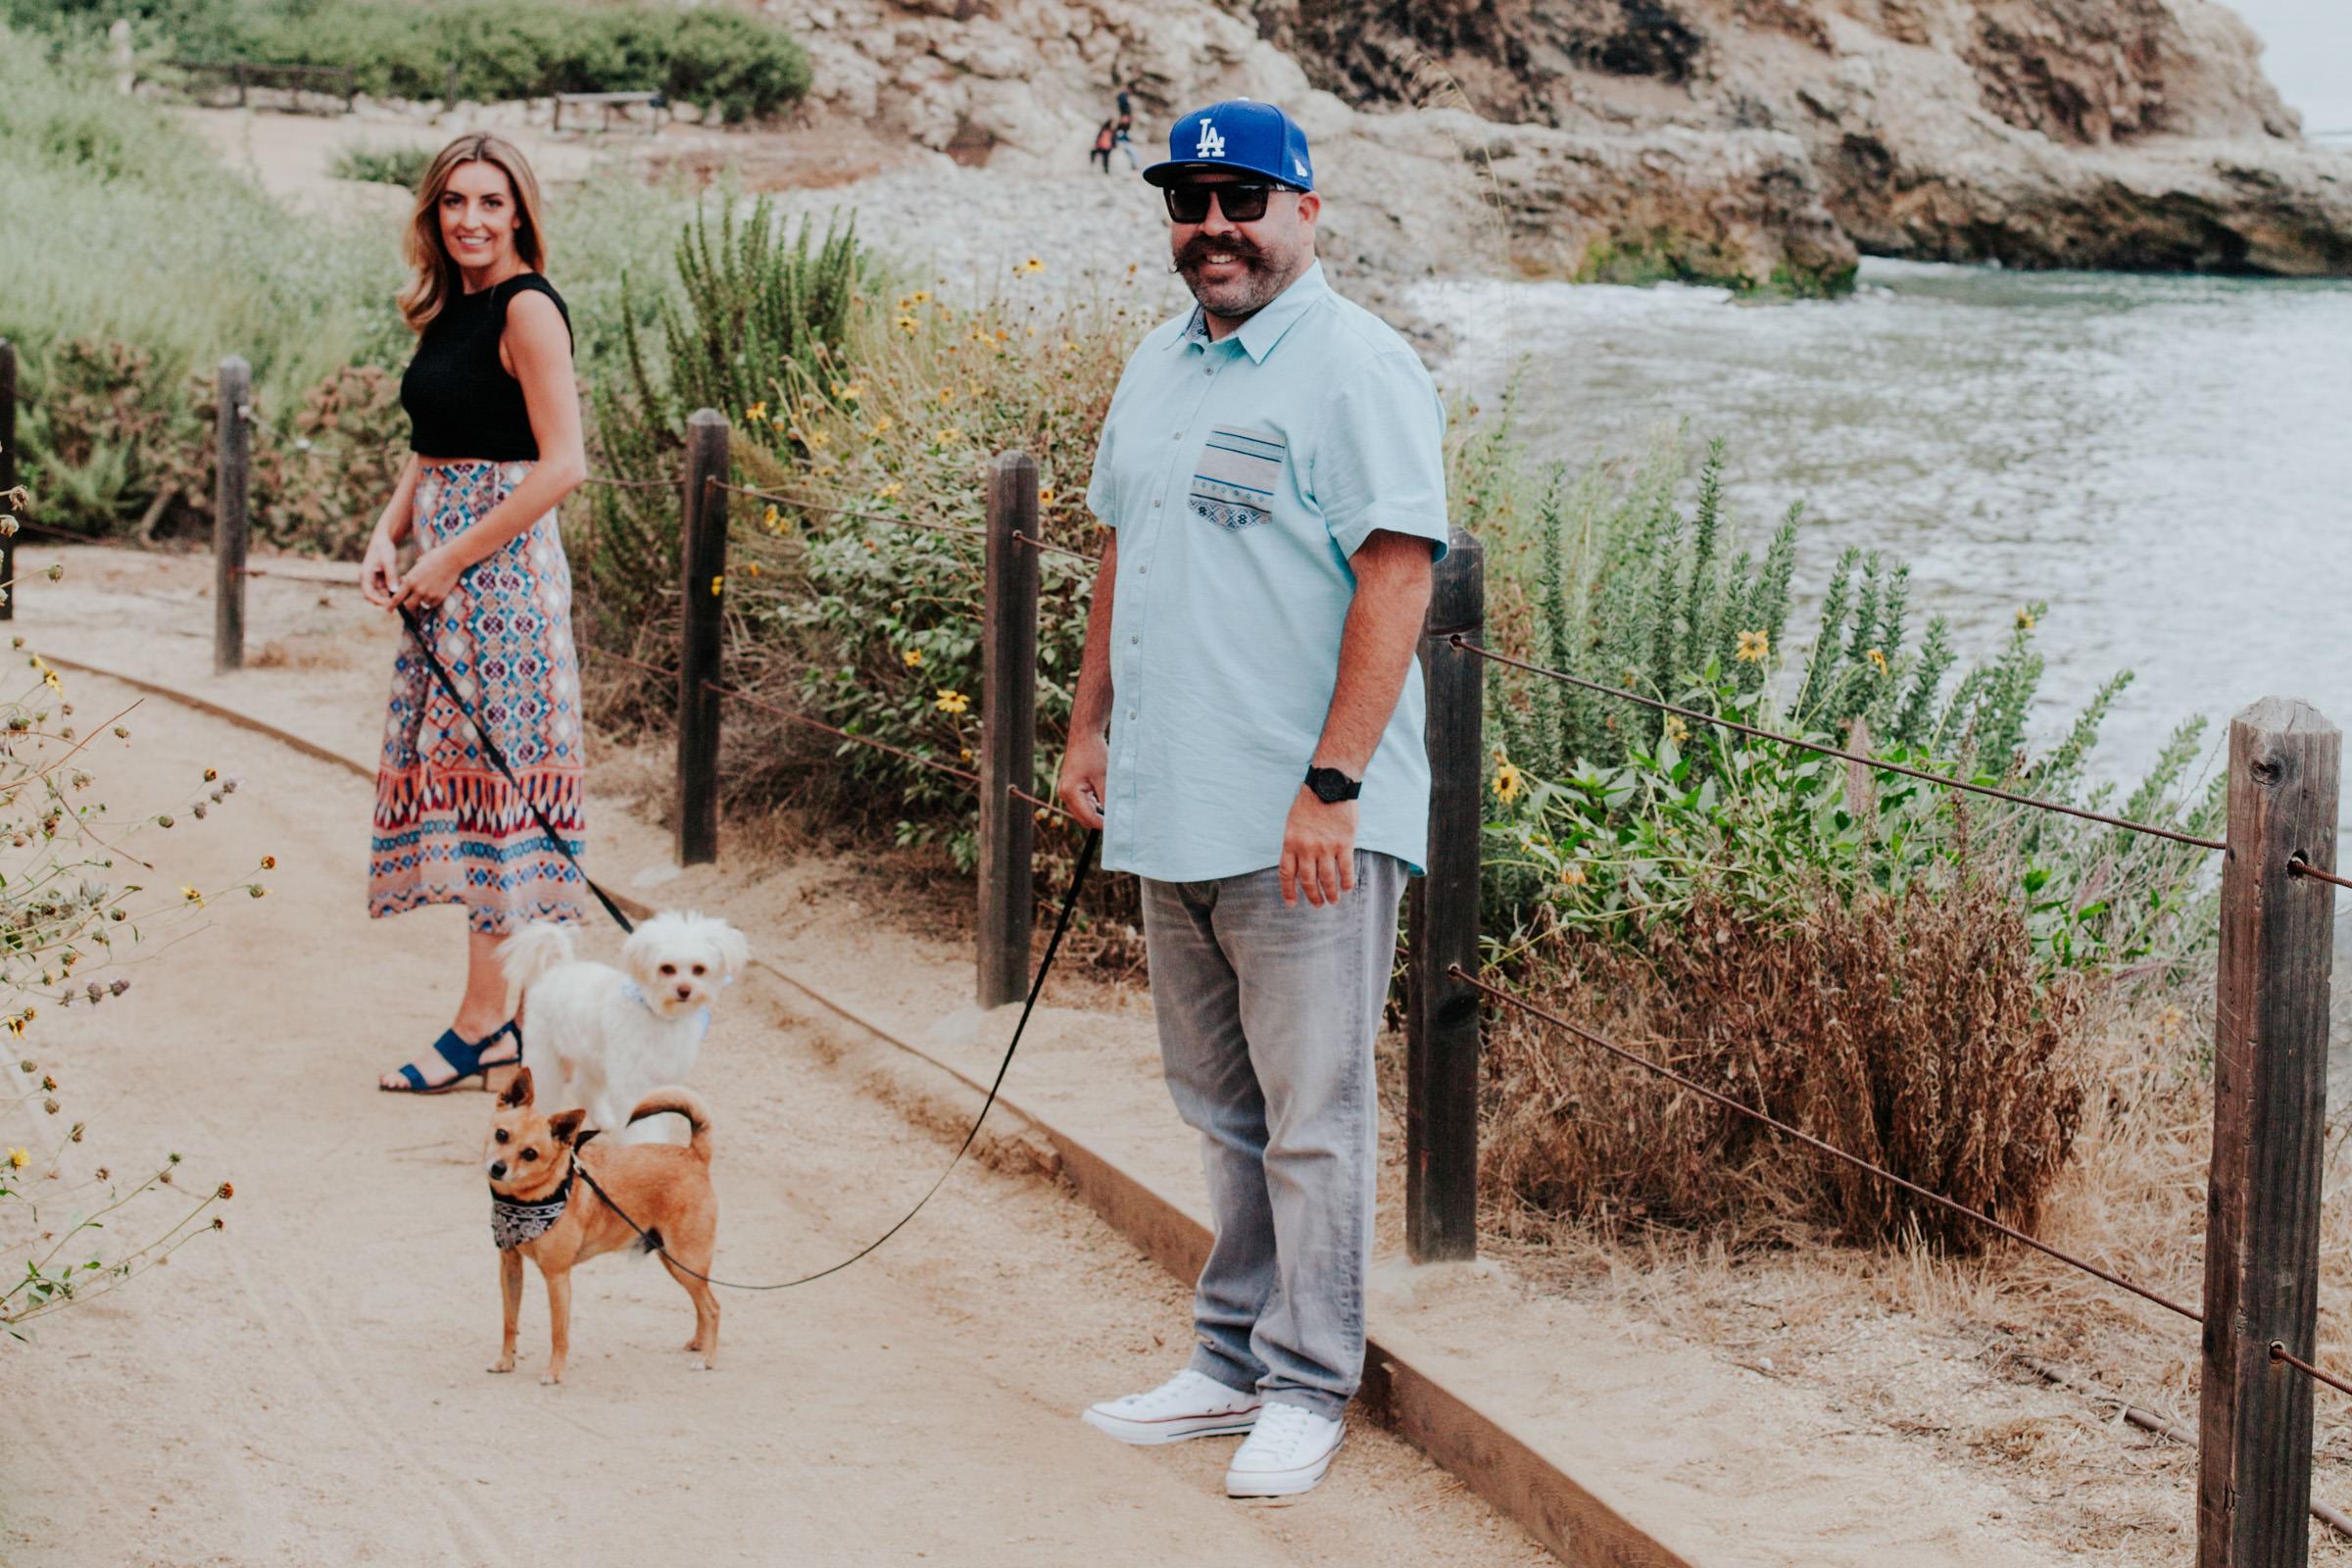 terranea-resort-palos-verdes-california-wedding-photography-cove-los-angeles-pierce-85.jpg